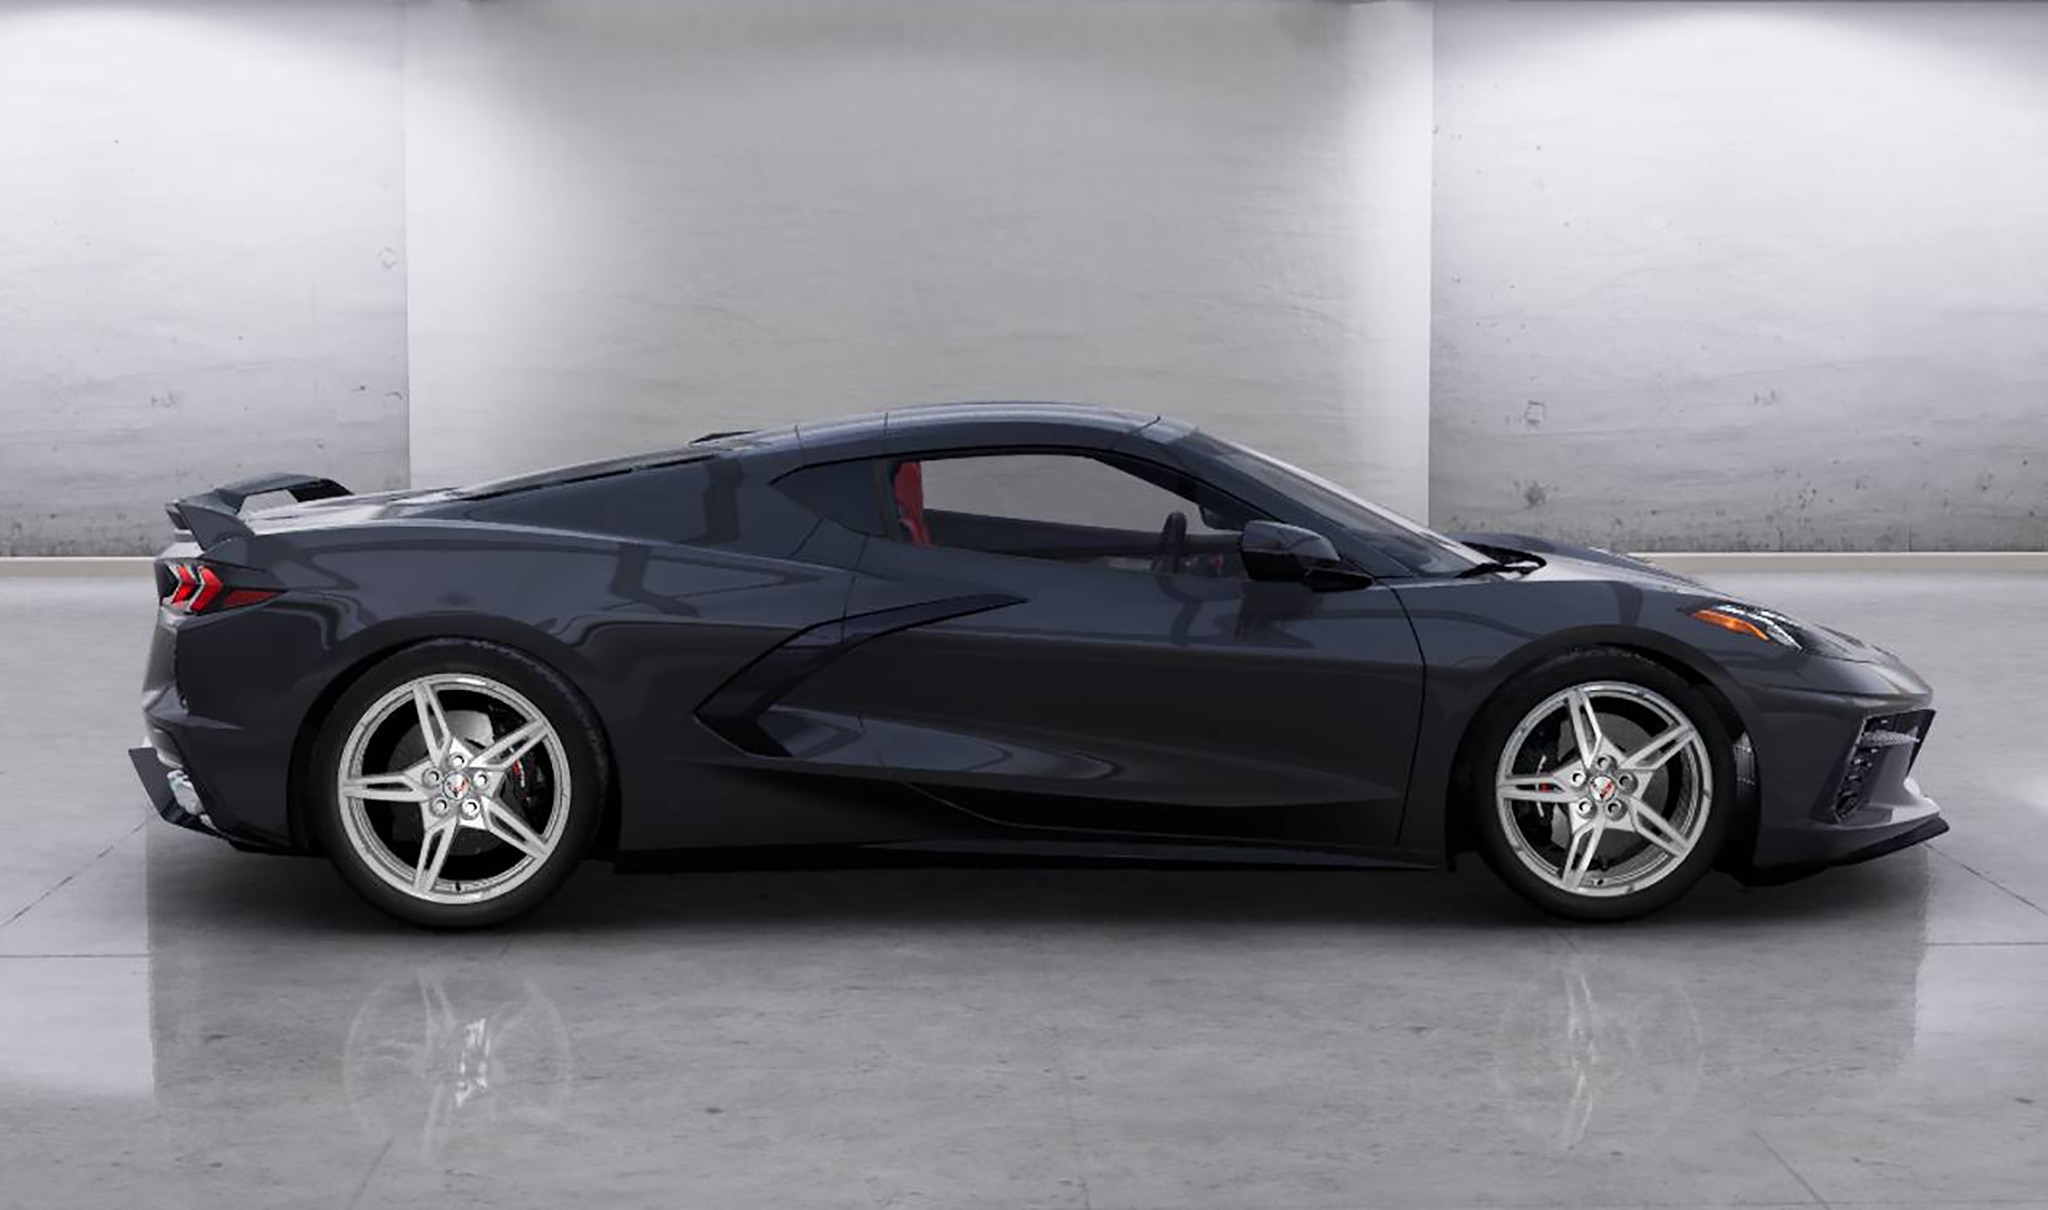 2020 Chevrolet Corvette: The Perfect Way to Option the C8 | Automobile Magazine - Automobile